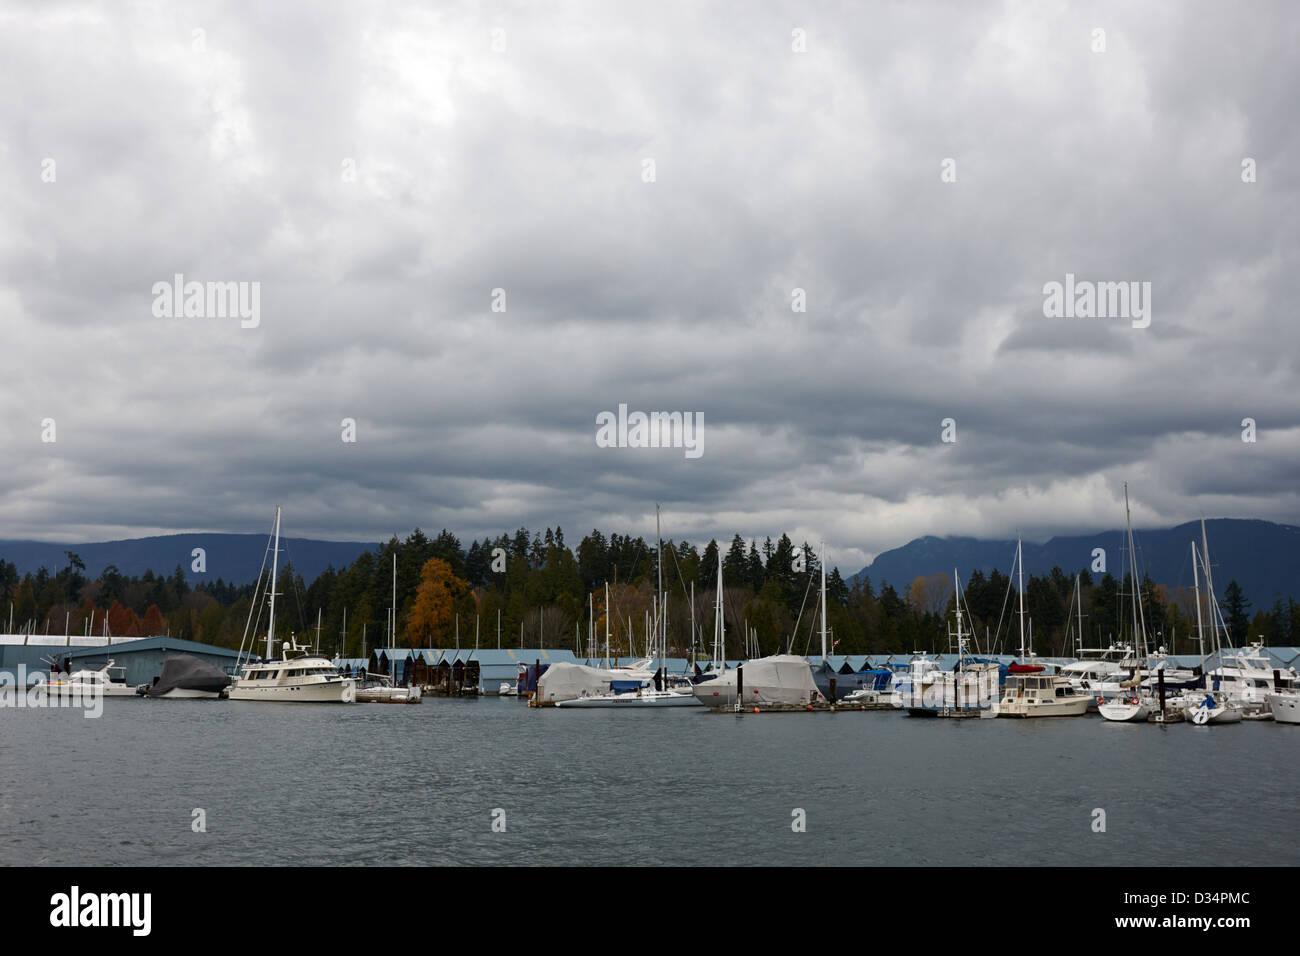 Royal Vancouver Yacht Club marina at Jericho Beach under cloudy overcast sky BC Canada - Stock Image